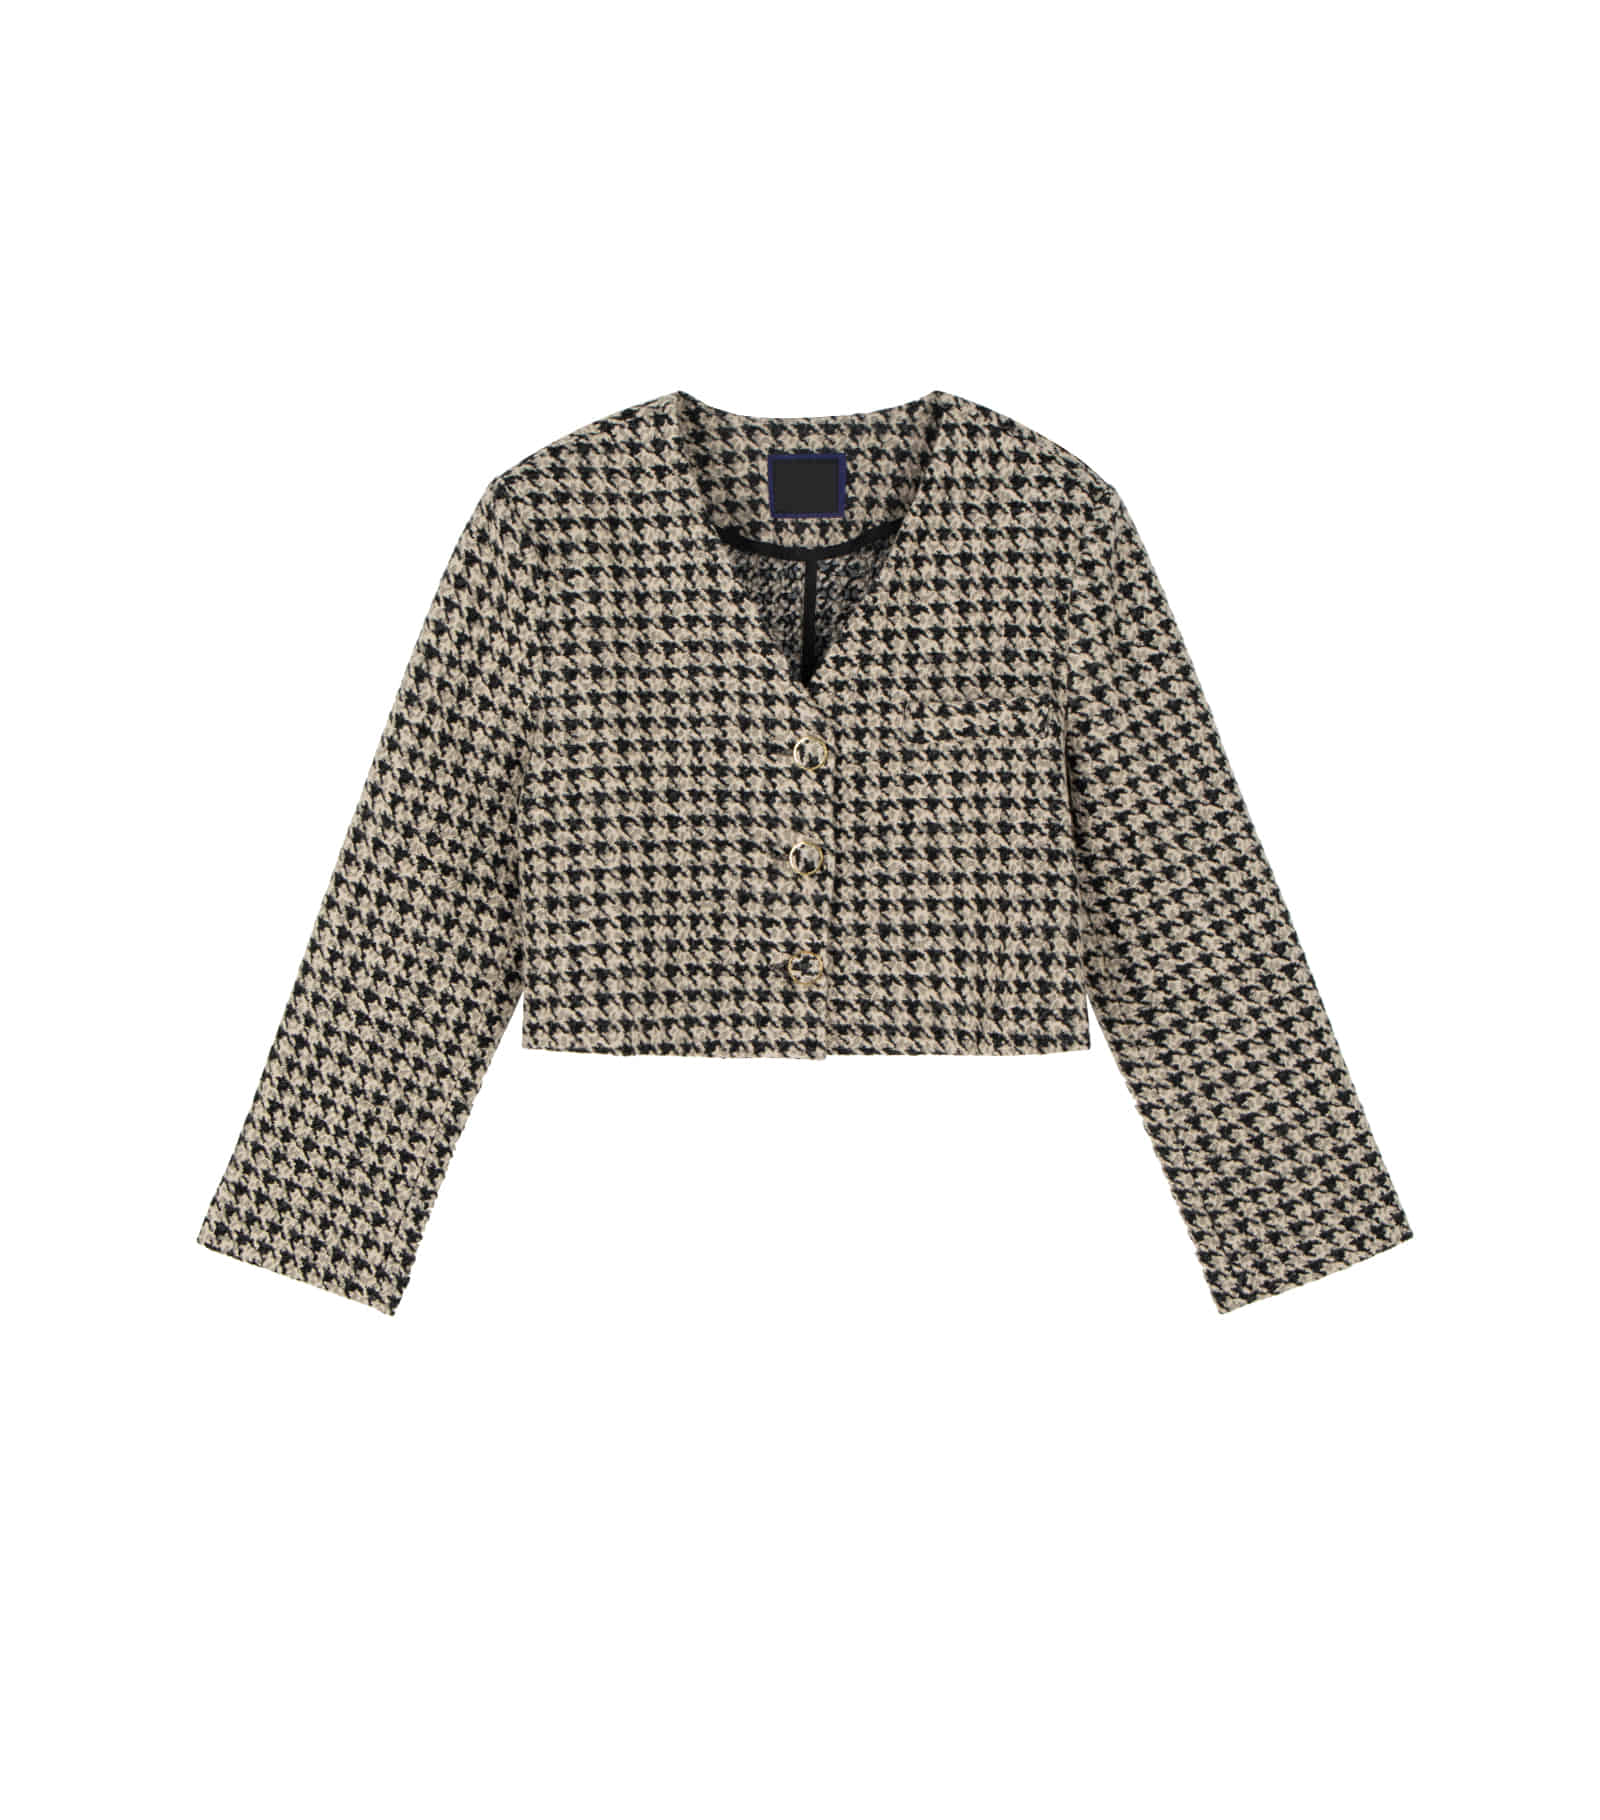 Bowdon Hound Check Short Jacket